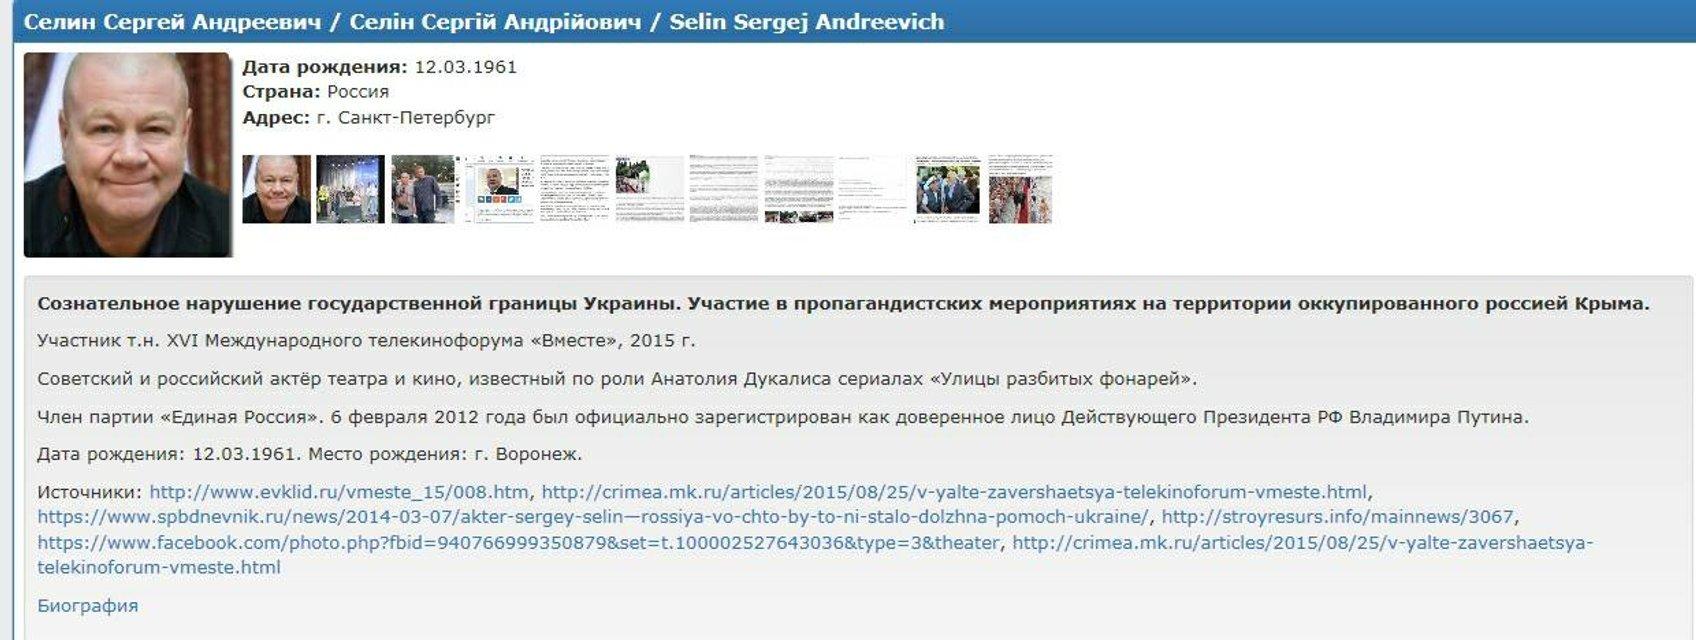 Сергей Селин попал в базу Миротворца - фото 63977